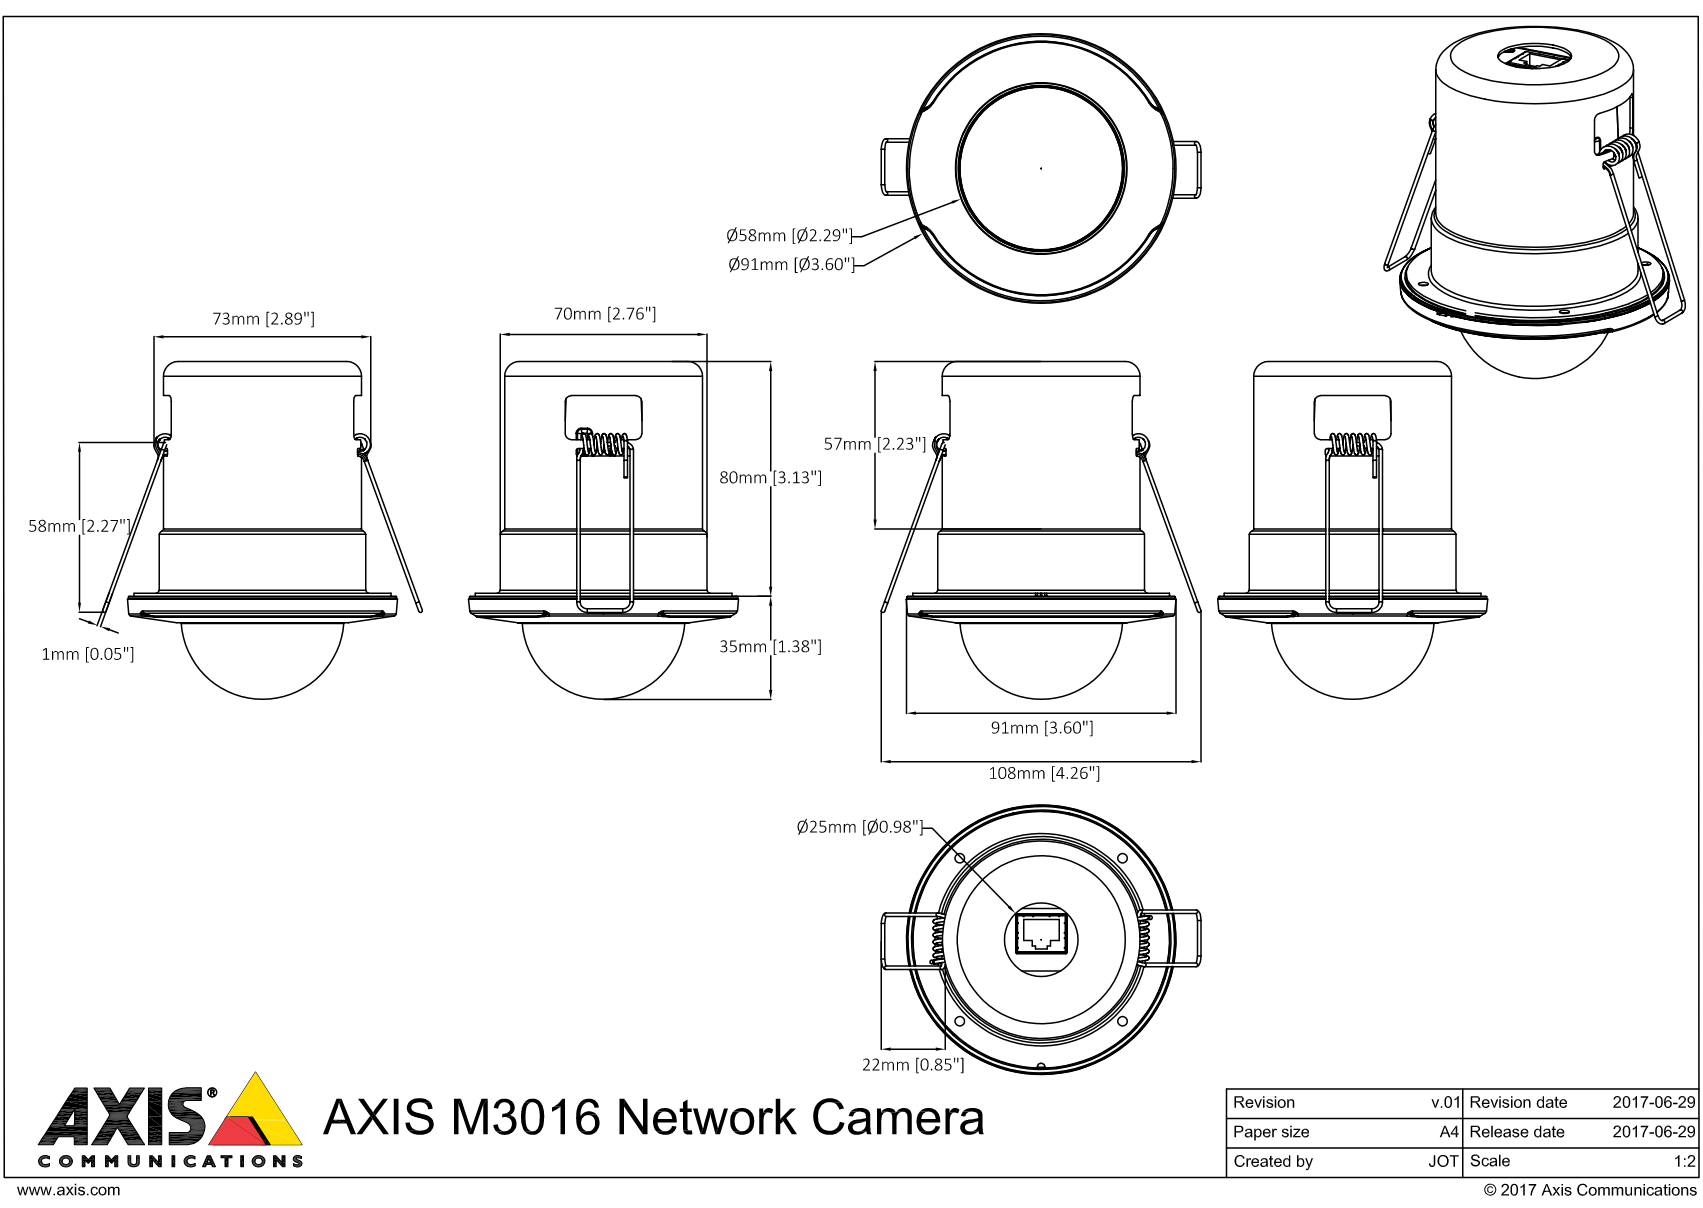 M3016 Dimensions